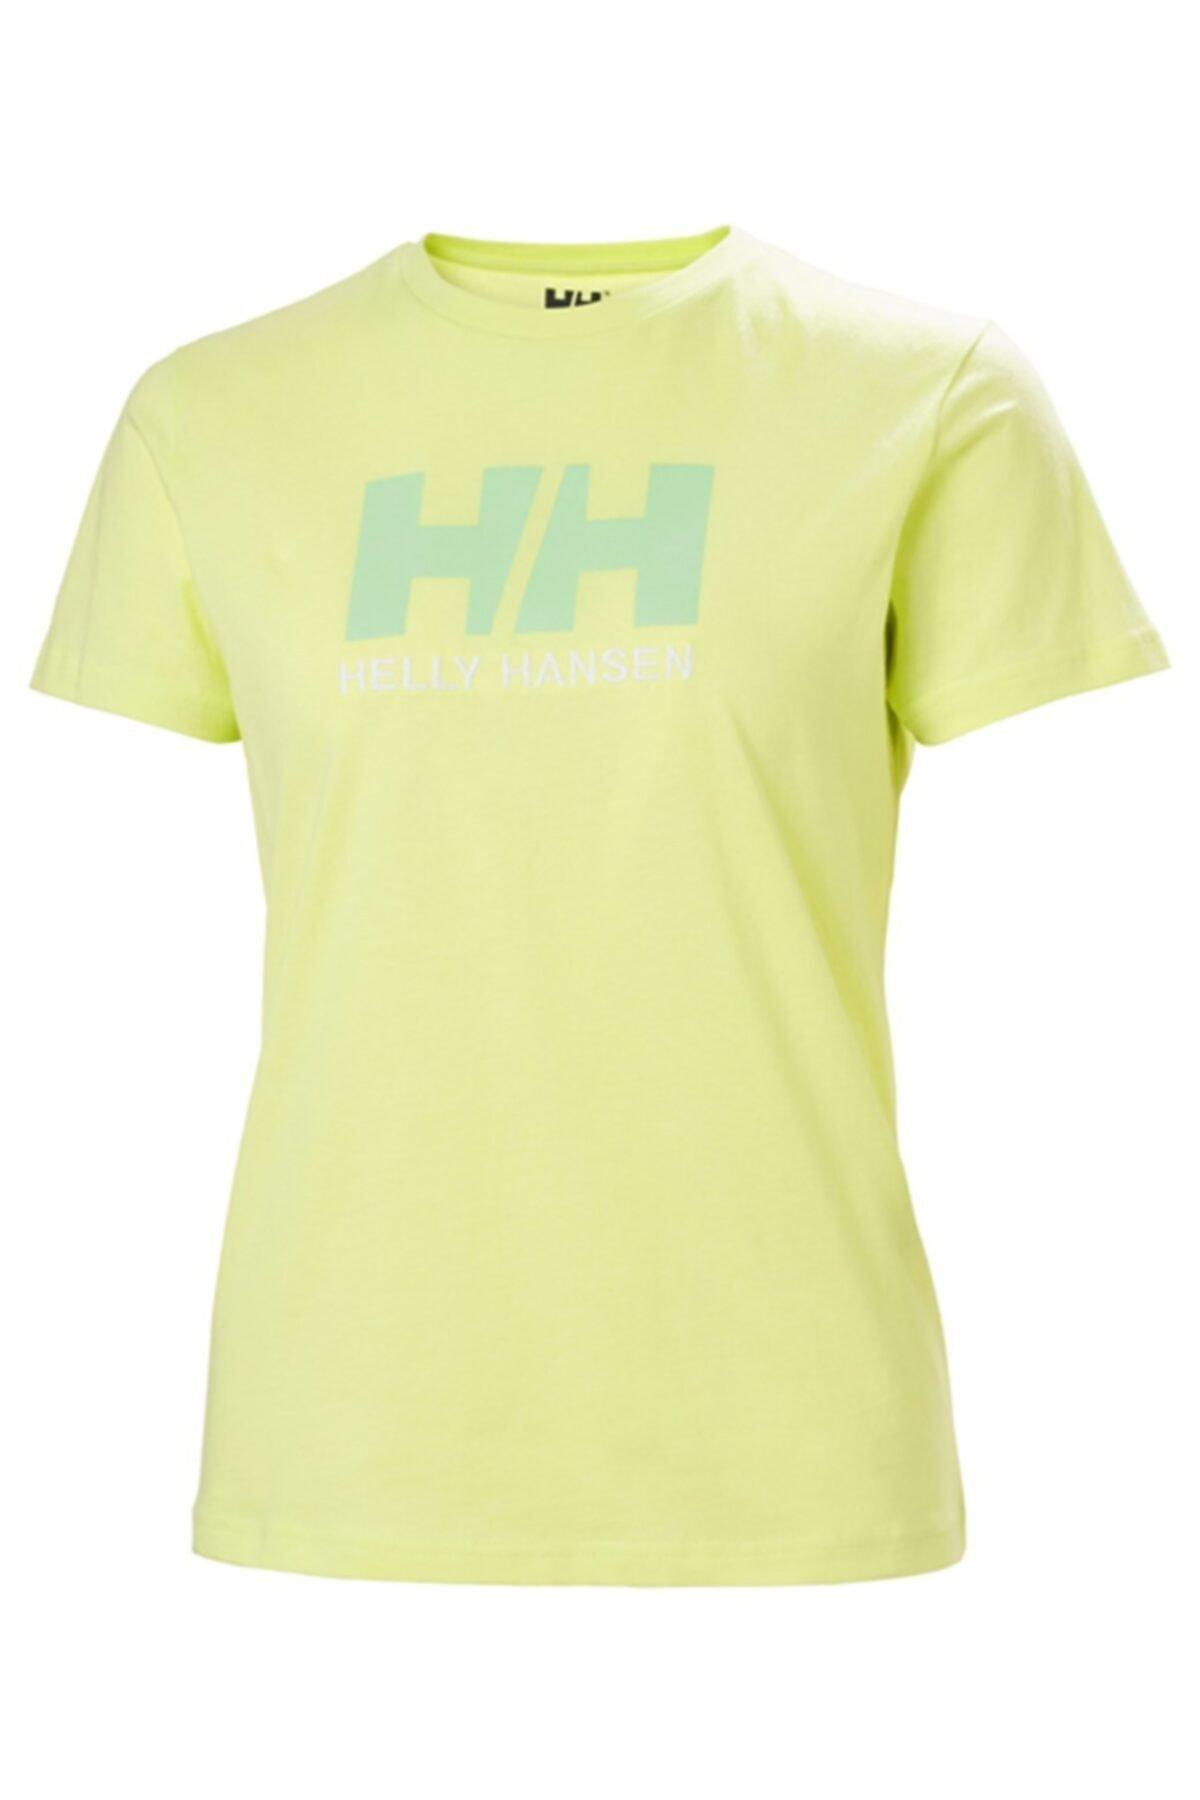 Helly Hansen Kadın Yeşil T-Shirt 1